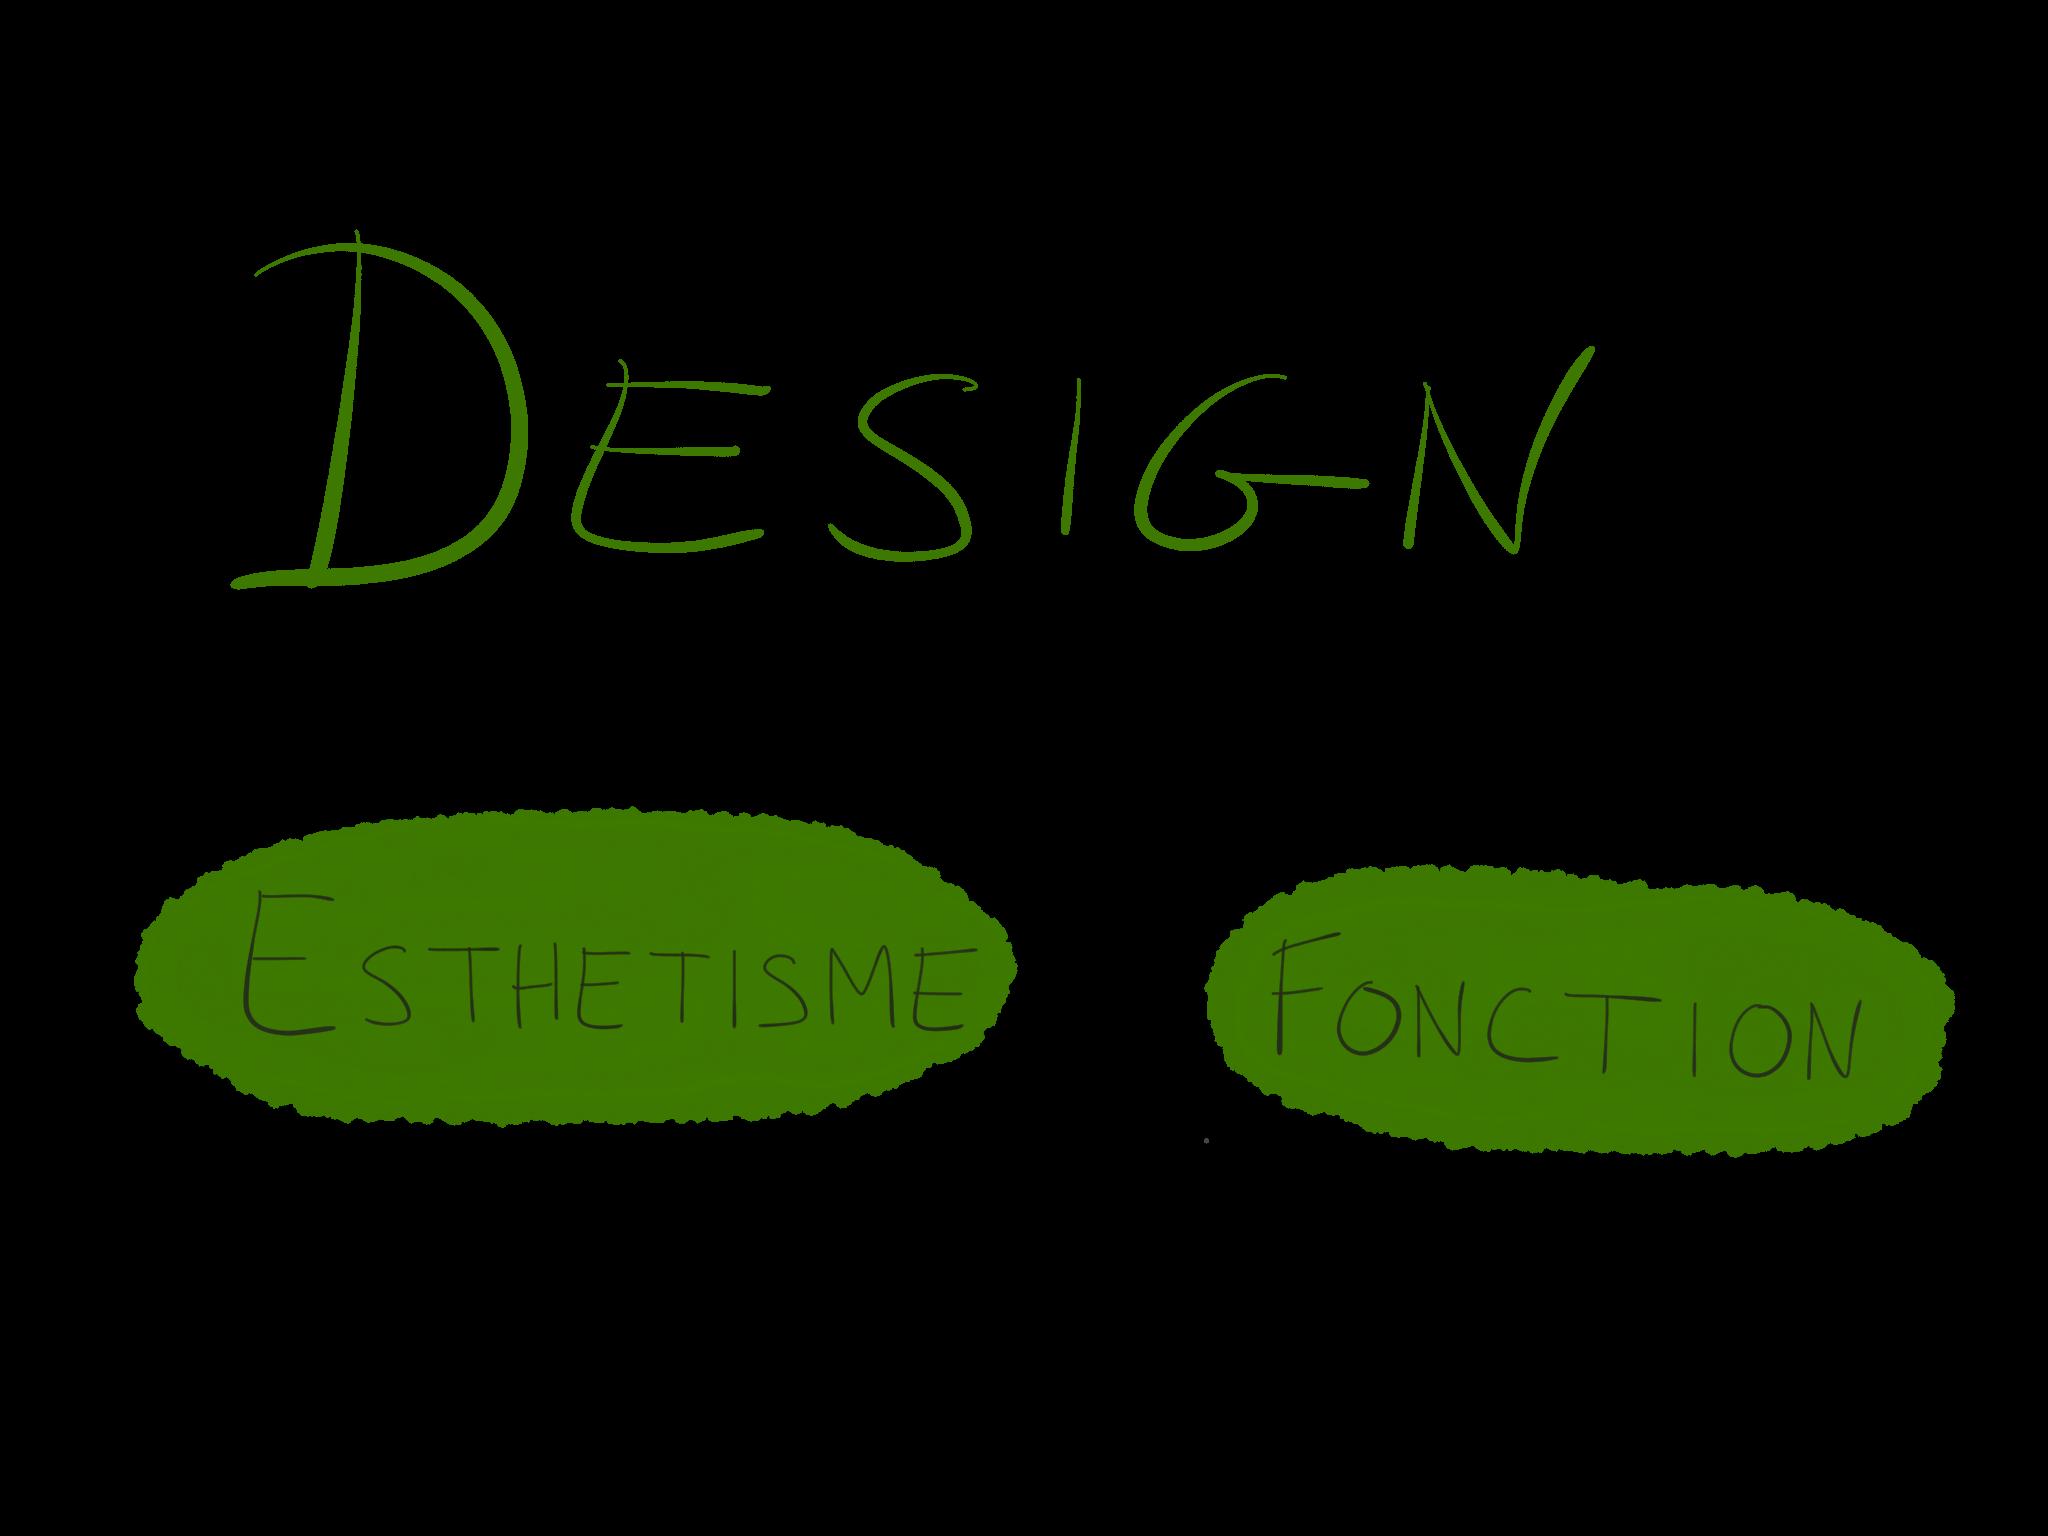 Design esthetisme et fonction